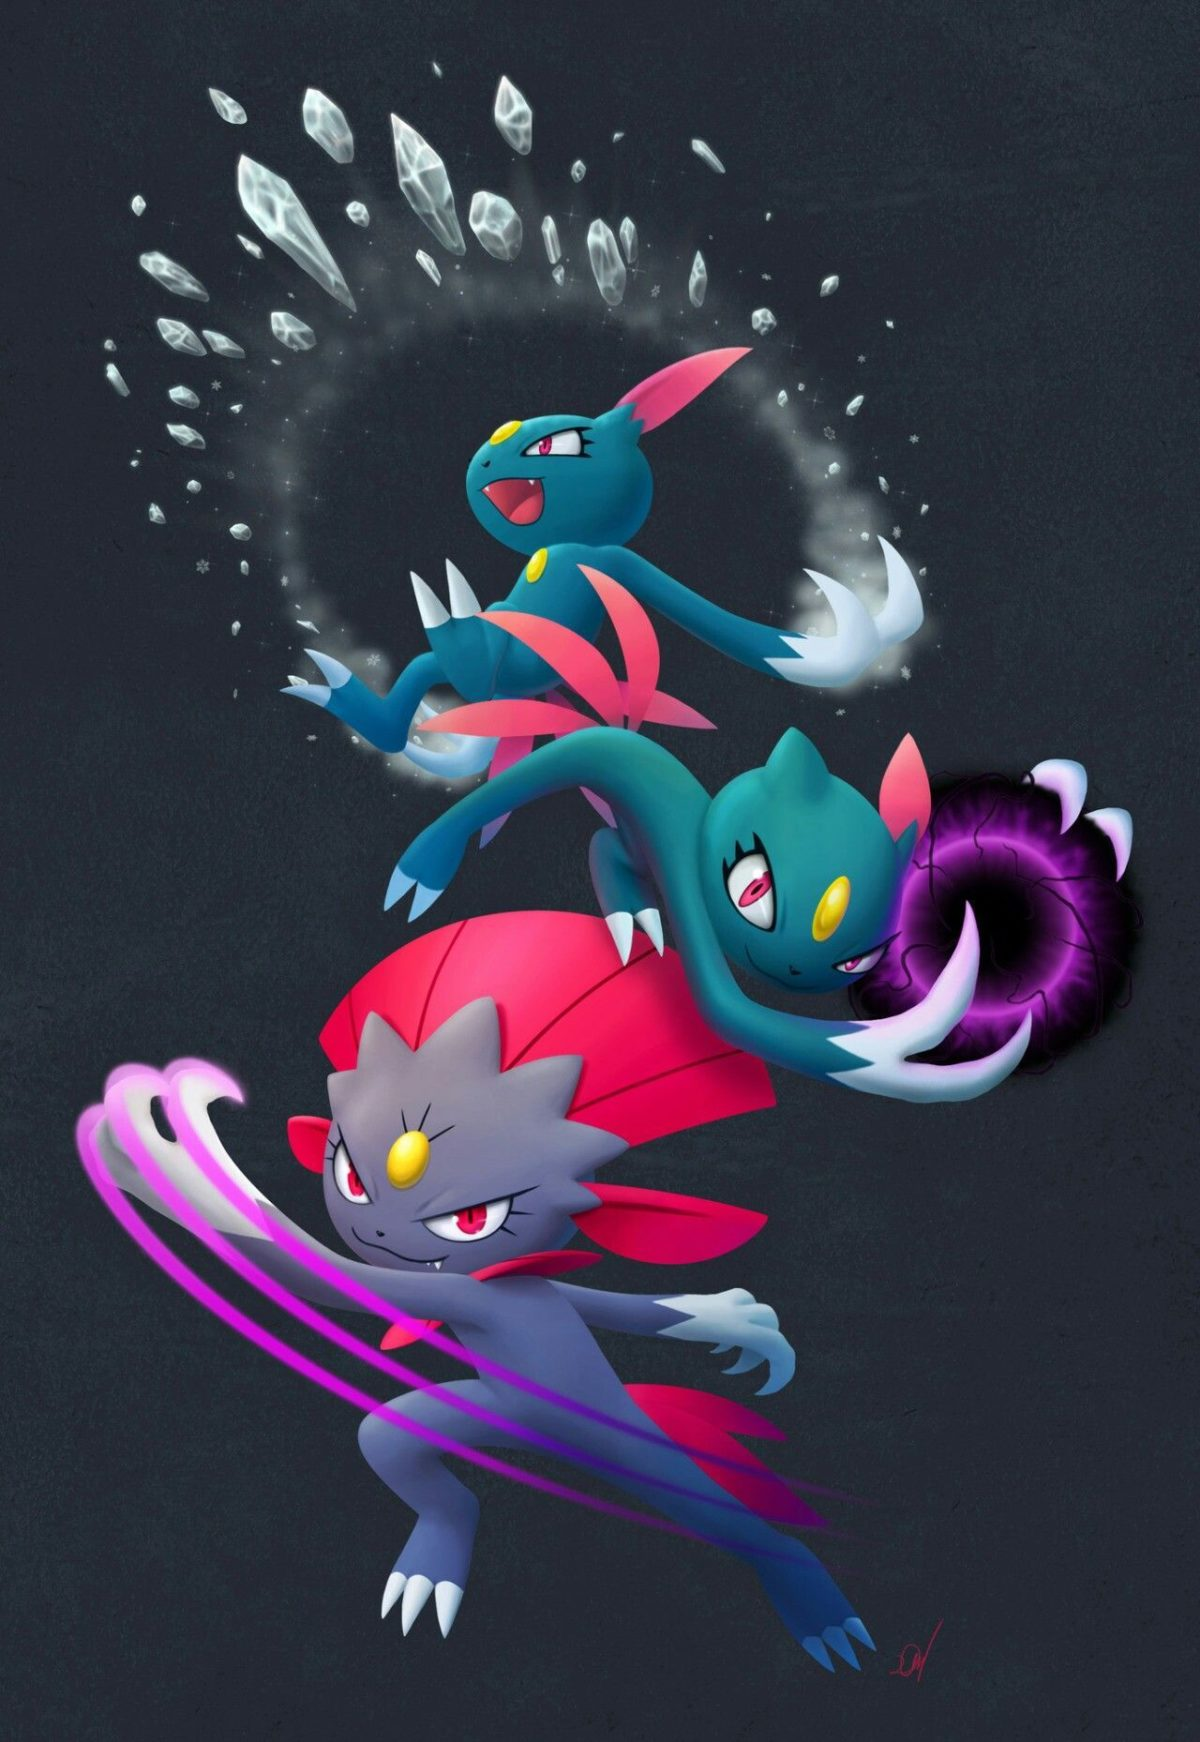 Sneasel and Weavile   Pokemon 2   Pinterest   Pokémon and Pokemon stuff